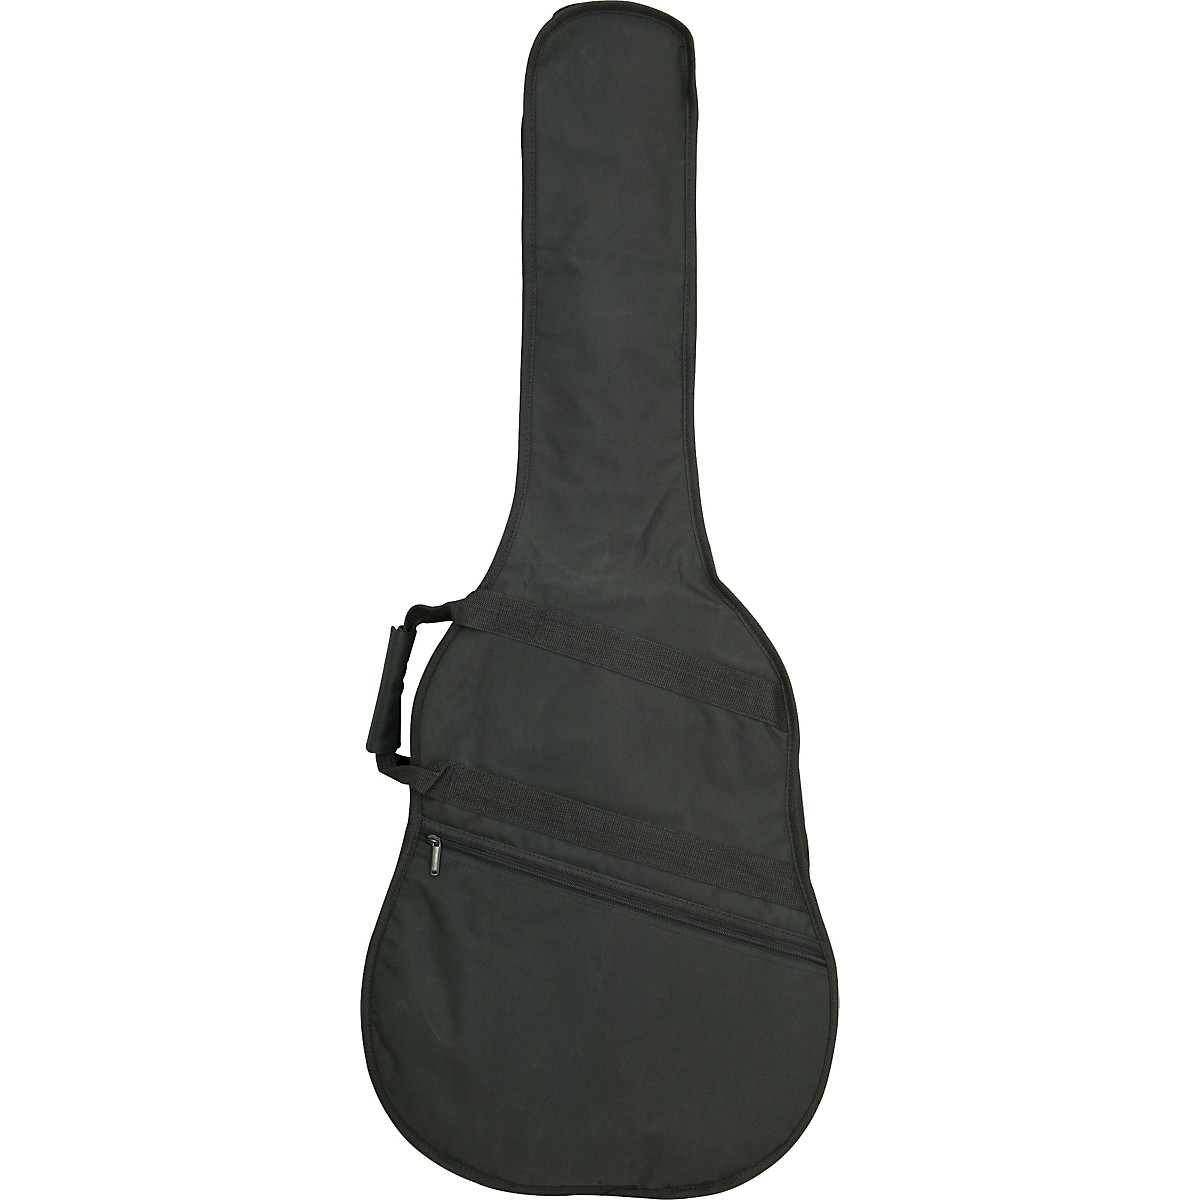 Musician's Gear Acoustic Guitar Gig Bag